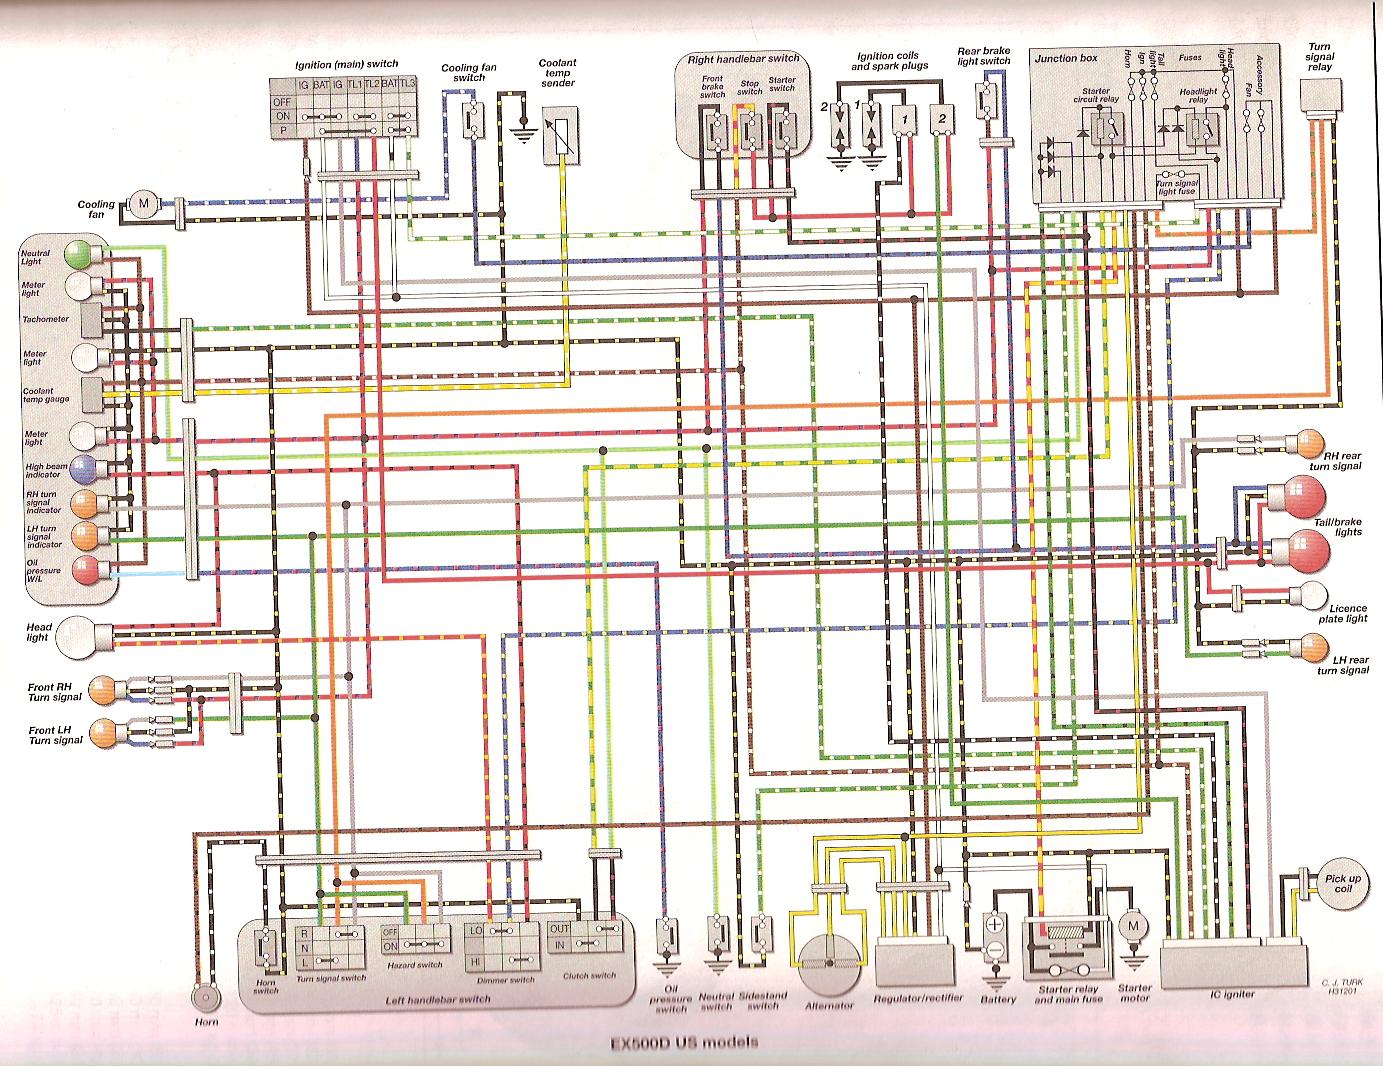 WRG-7679] Kawasaki Z250 Wiring Diagram on